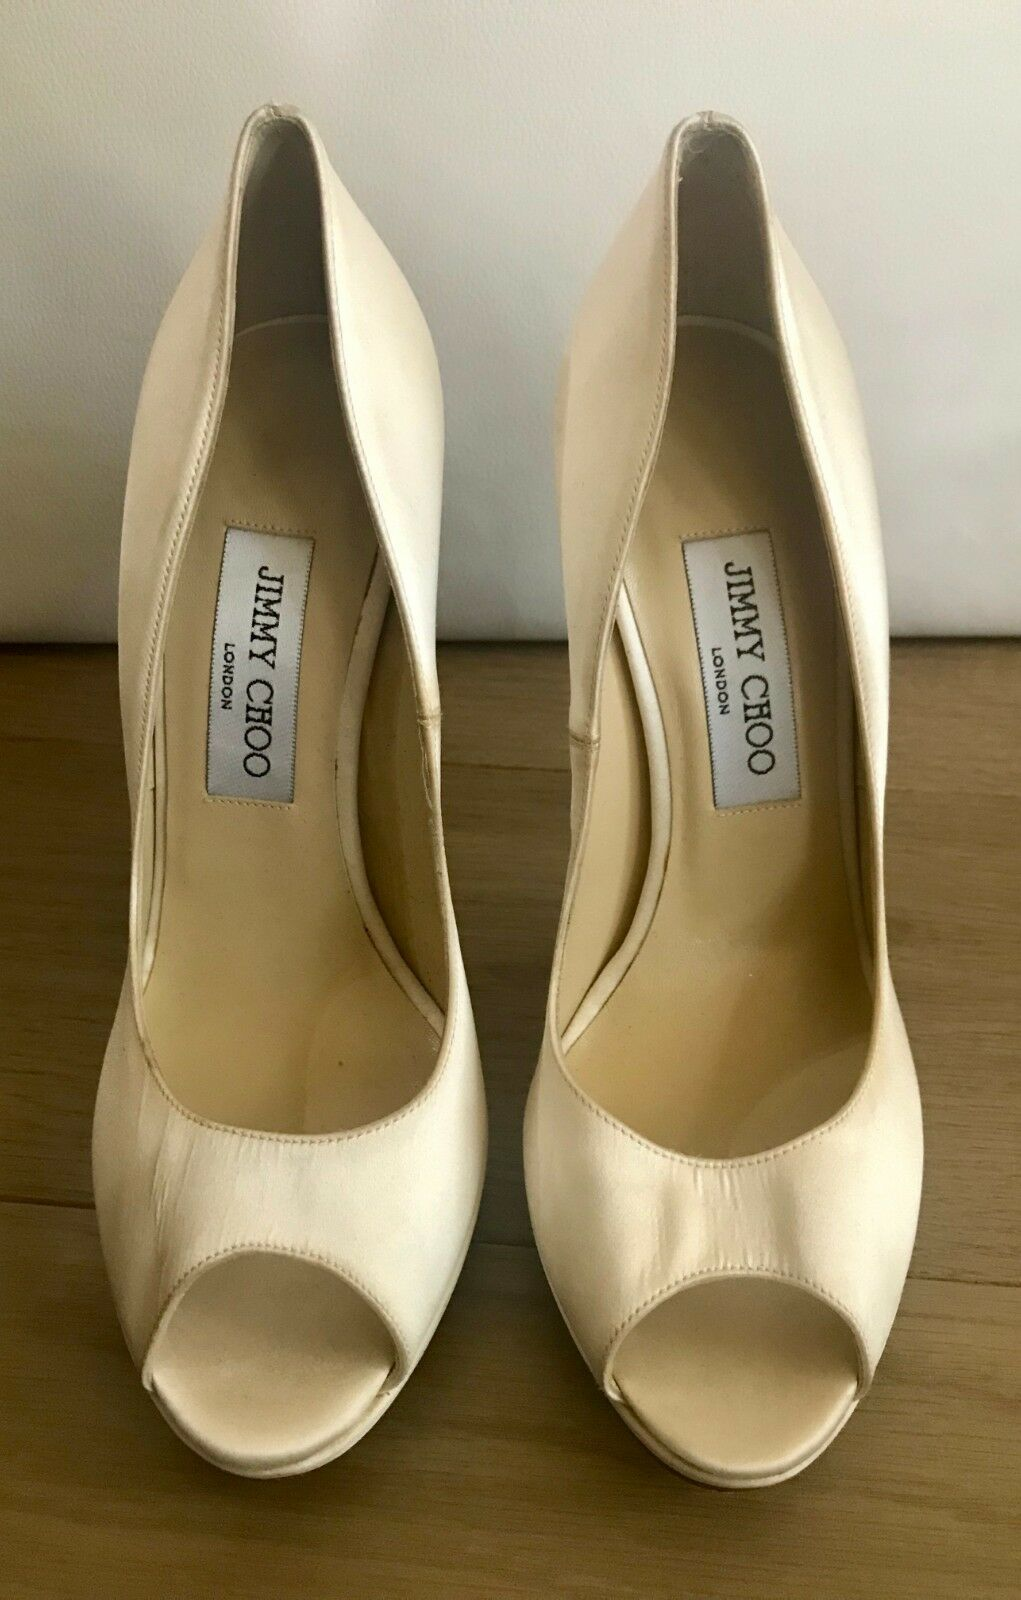 Jimmy in Choo - 5 in Jimmy (approx. 12.70 cm) Boda Satén Zapatos Con Plataforma- b8b1a8